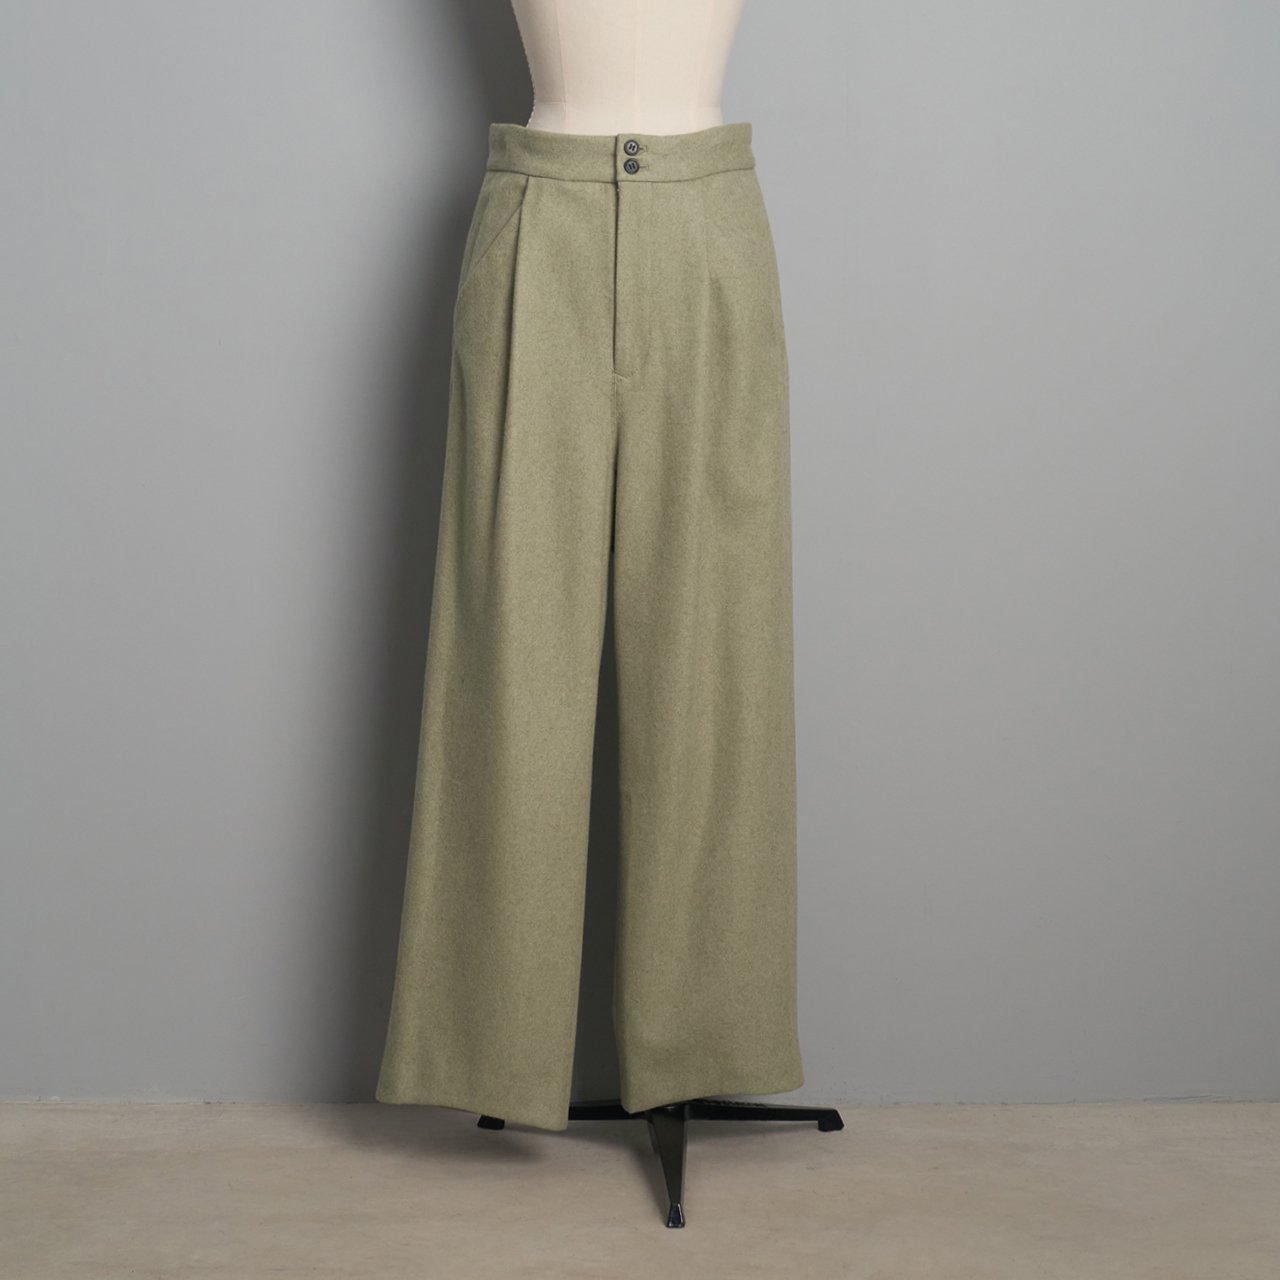 pelleq<BR>morningcut trousers<BR>sage